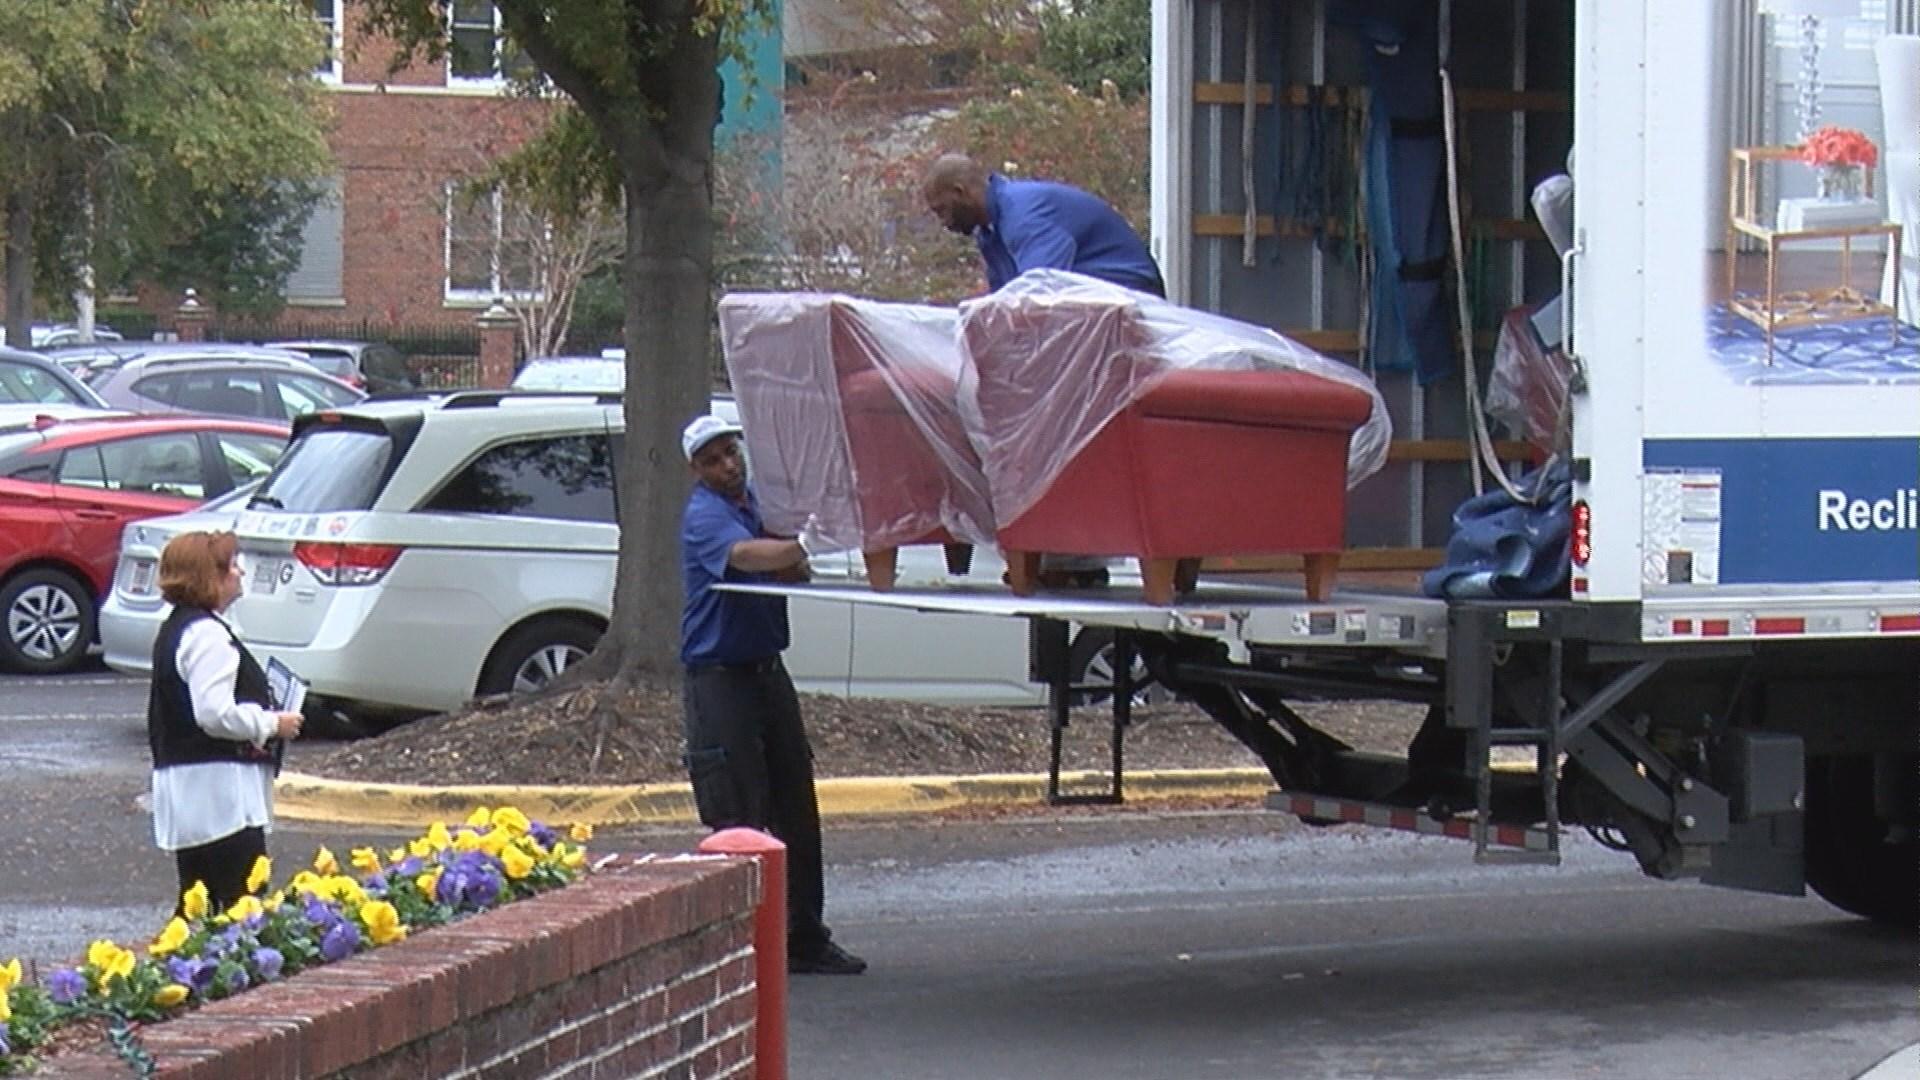 La-Z-Boy donates to Ronald McDonald House of Augusta (WFXG)